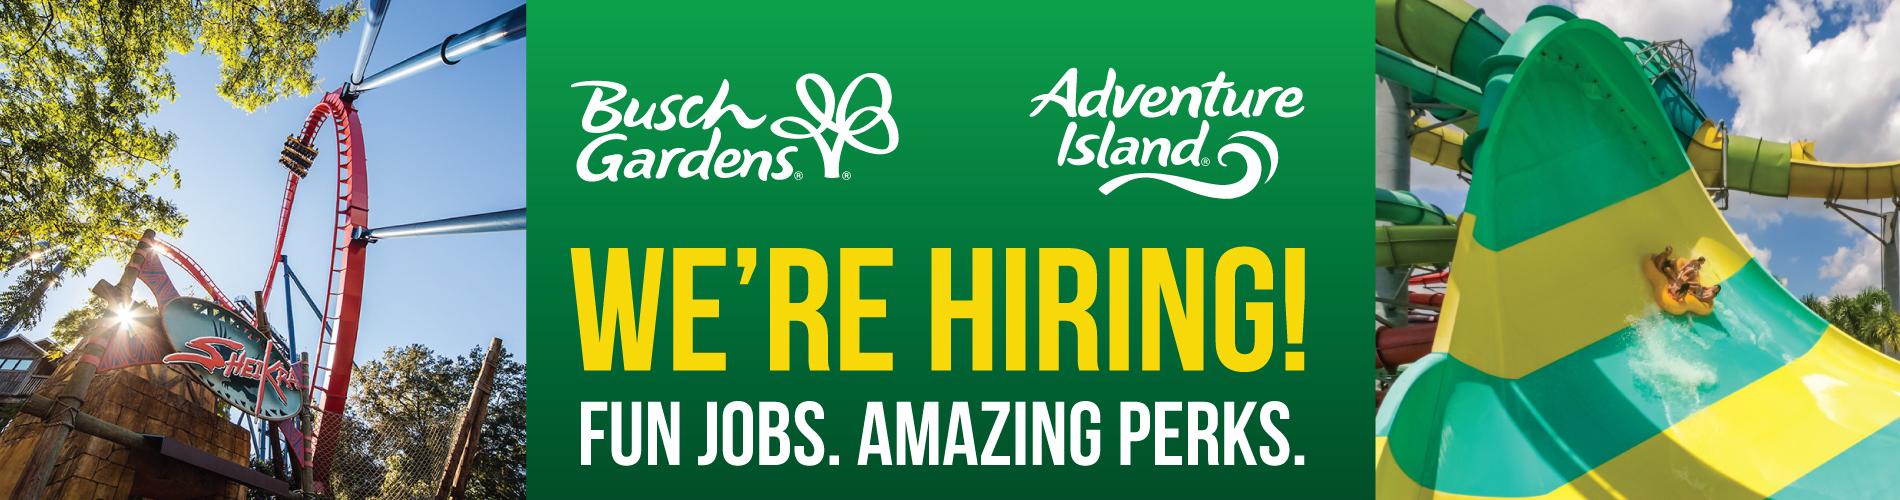 Busch Gardens Ride Operator and Adventure Island Lifeguard